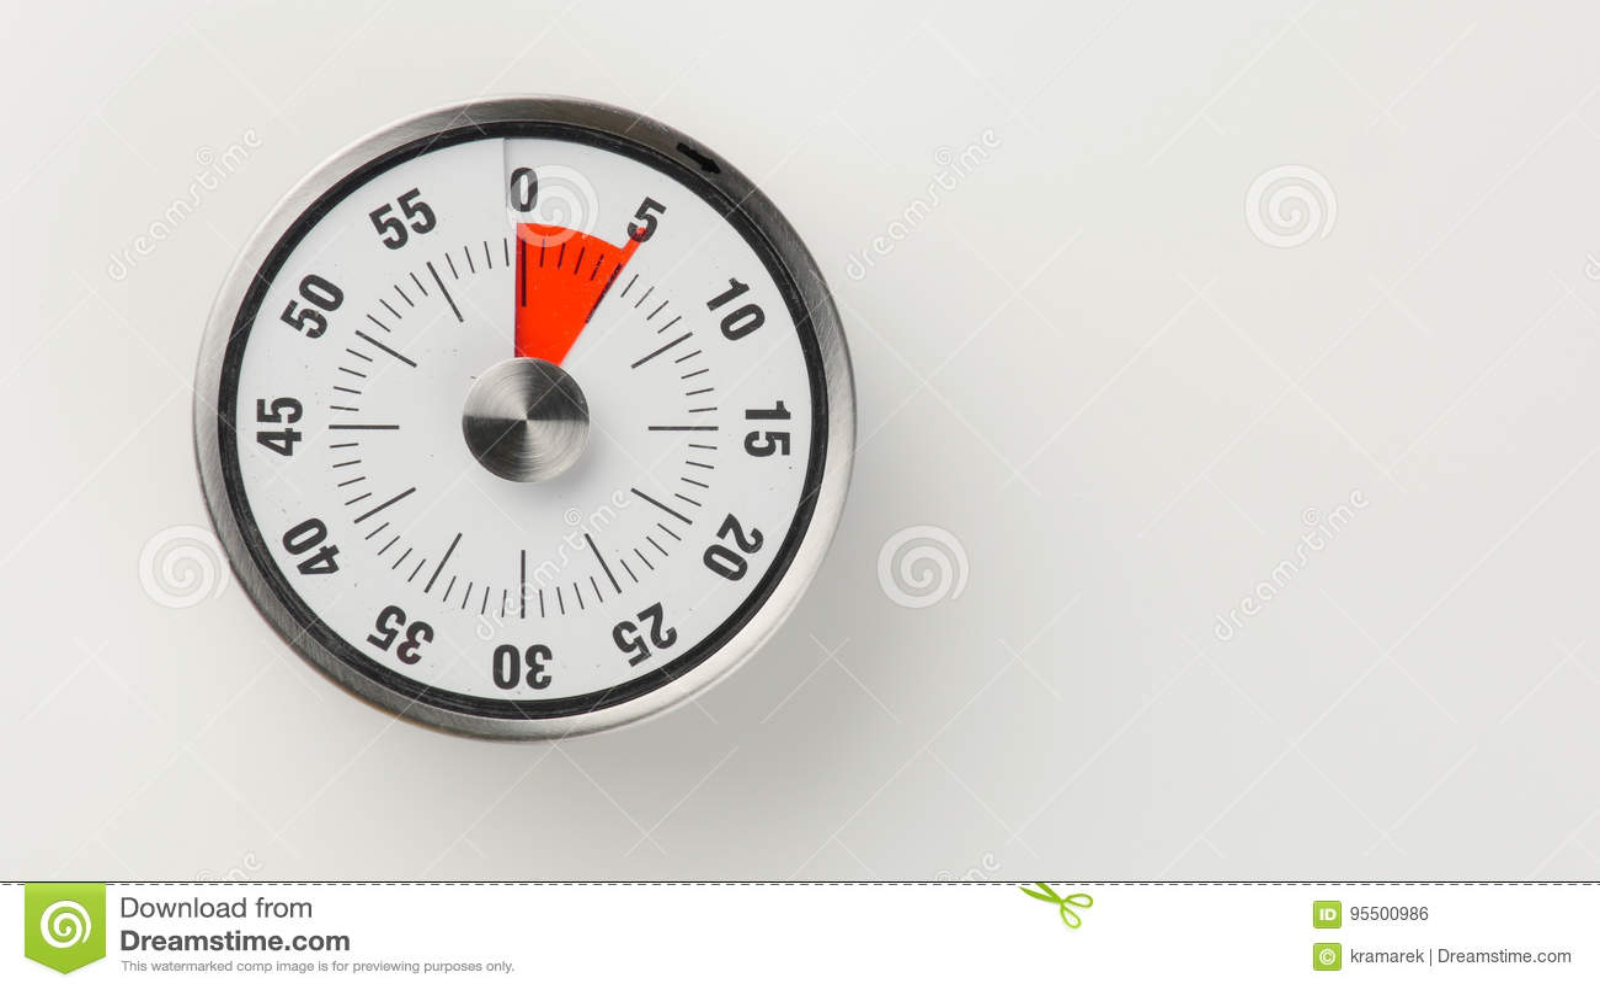 vintage analog kitchen countdown timer 5 minutes remaining stock